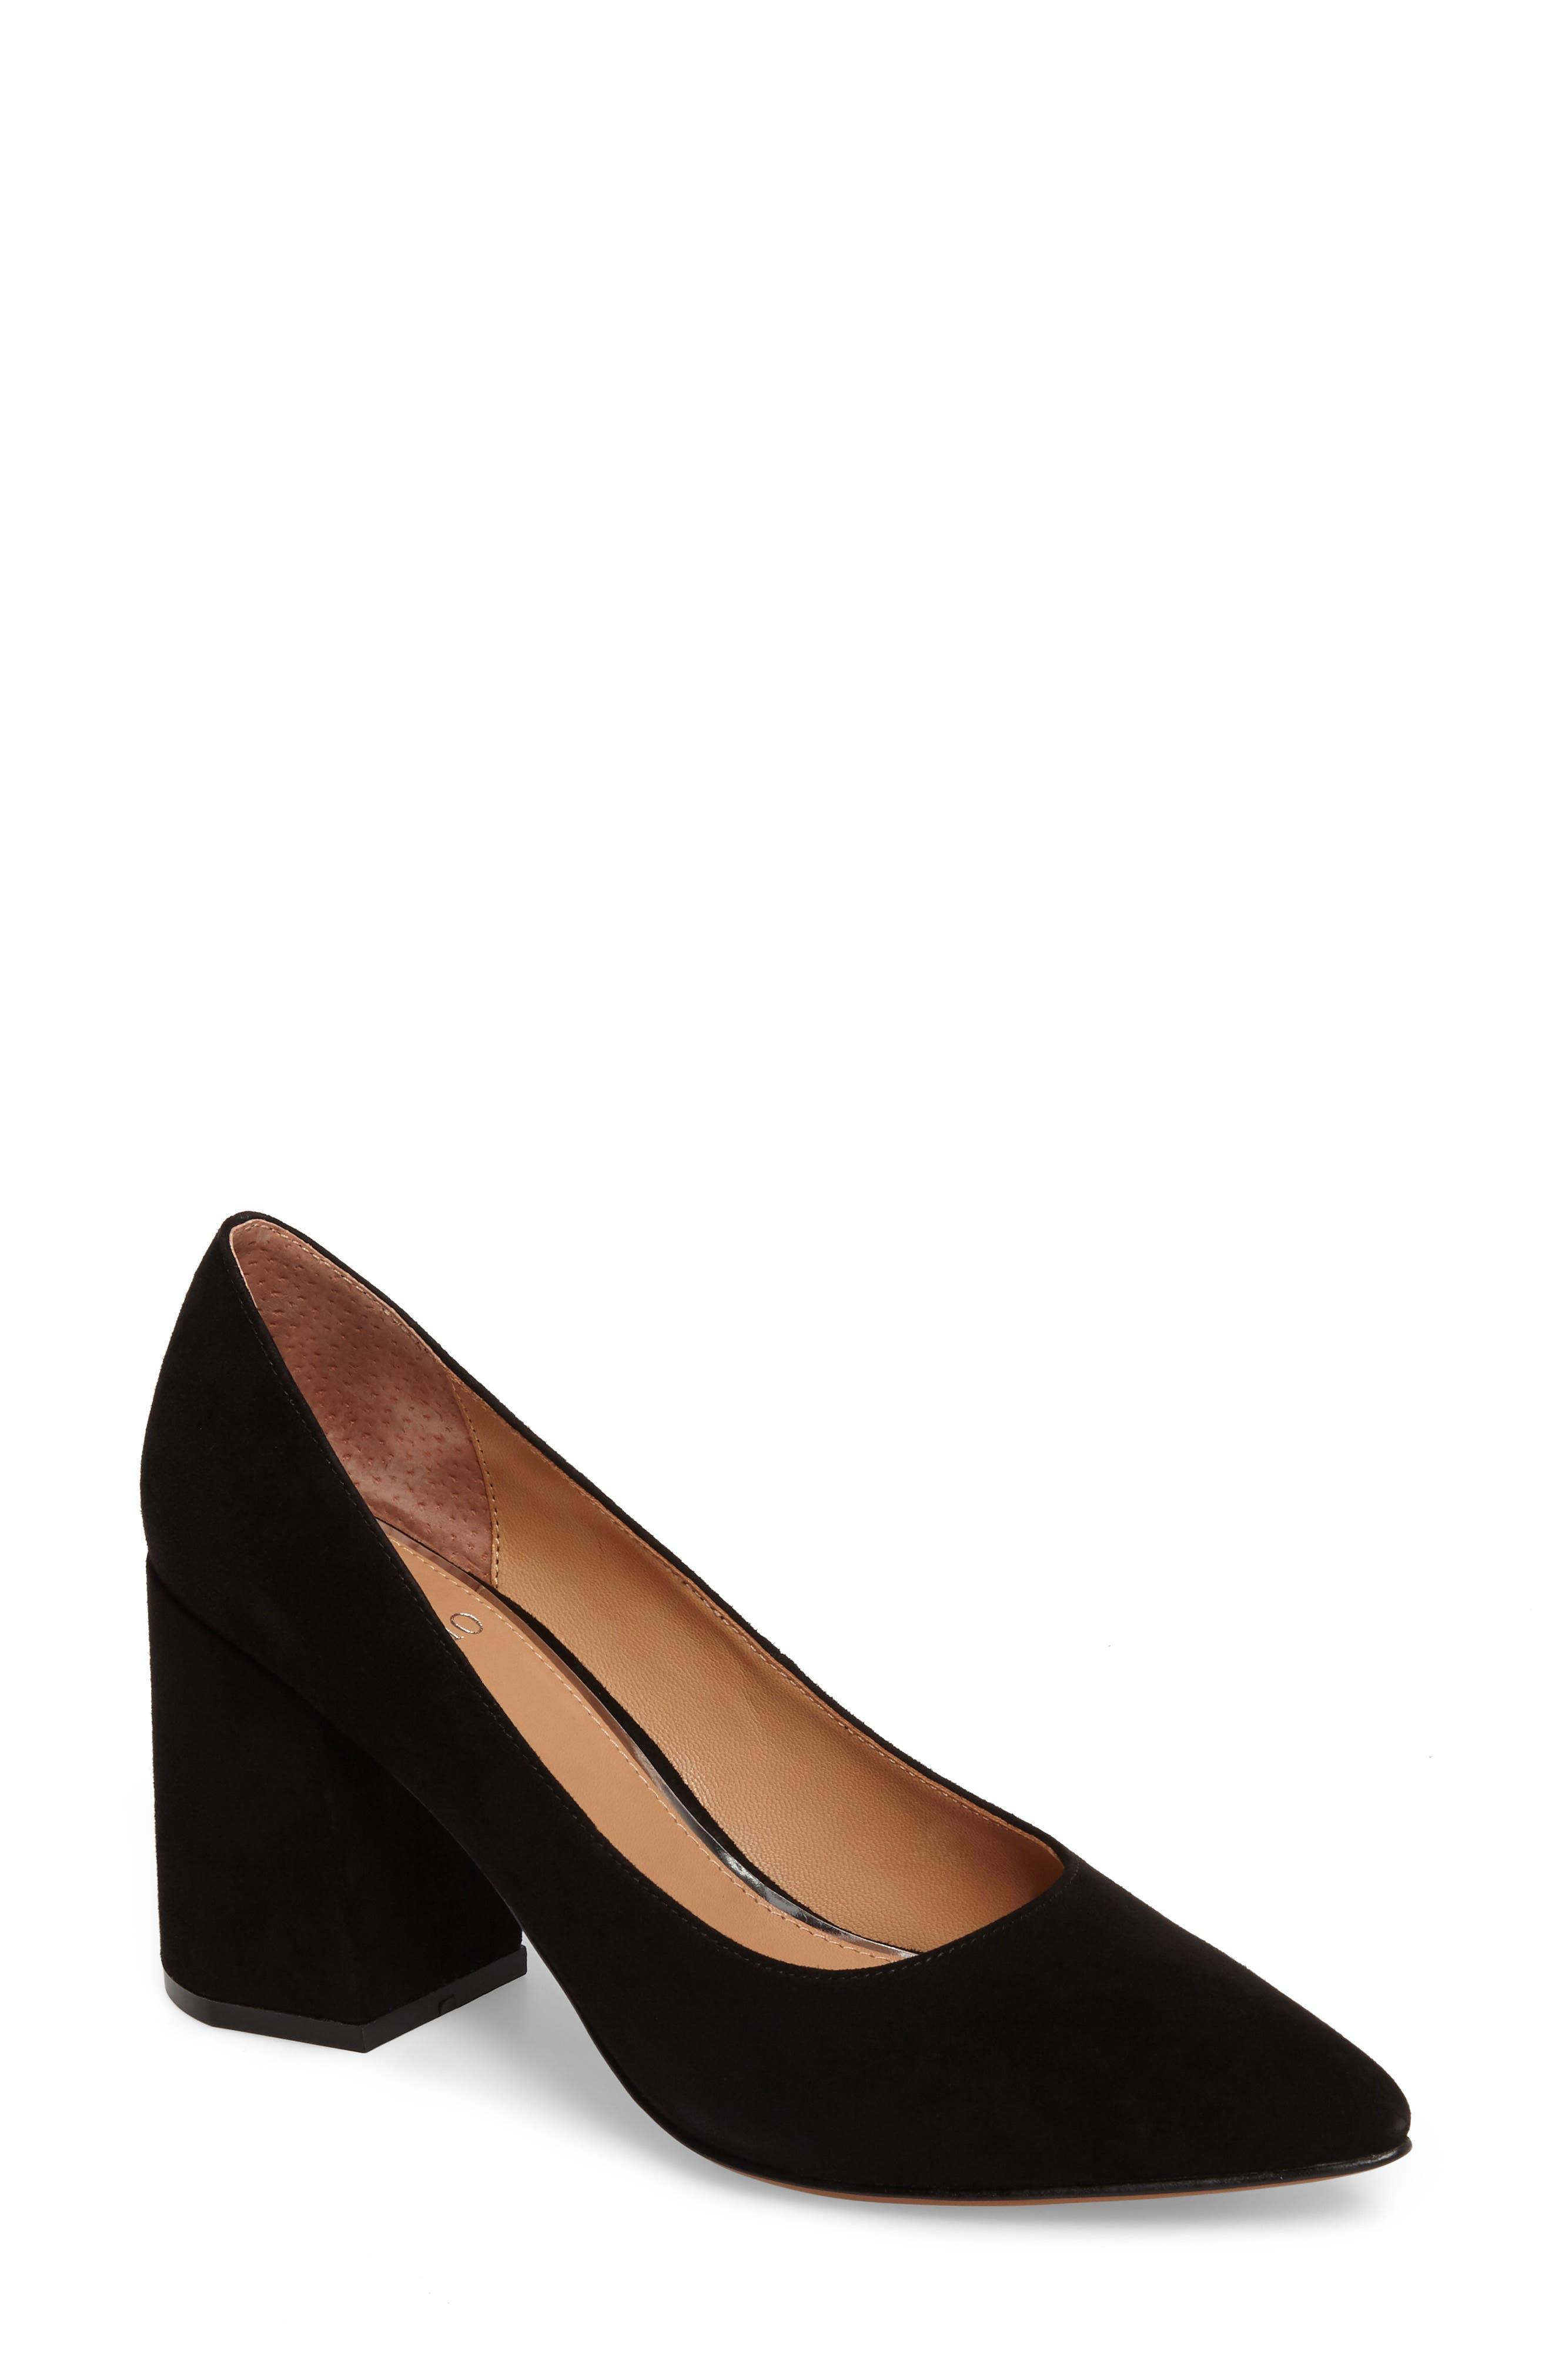 Alternate Image 1 Selected - Linea Paolo Blair Block Heel Pump (Women)